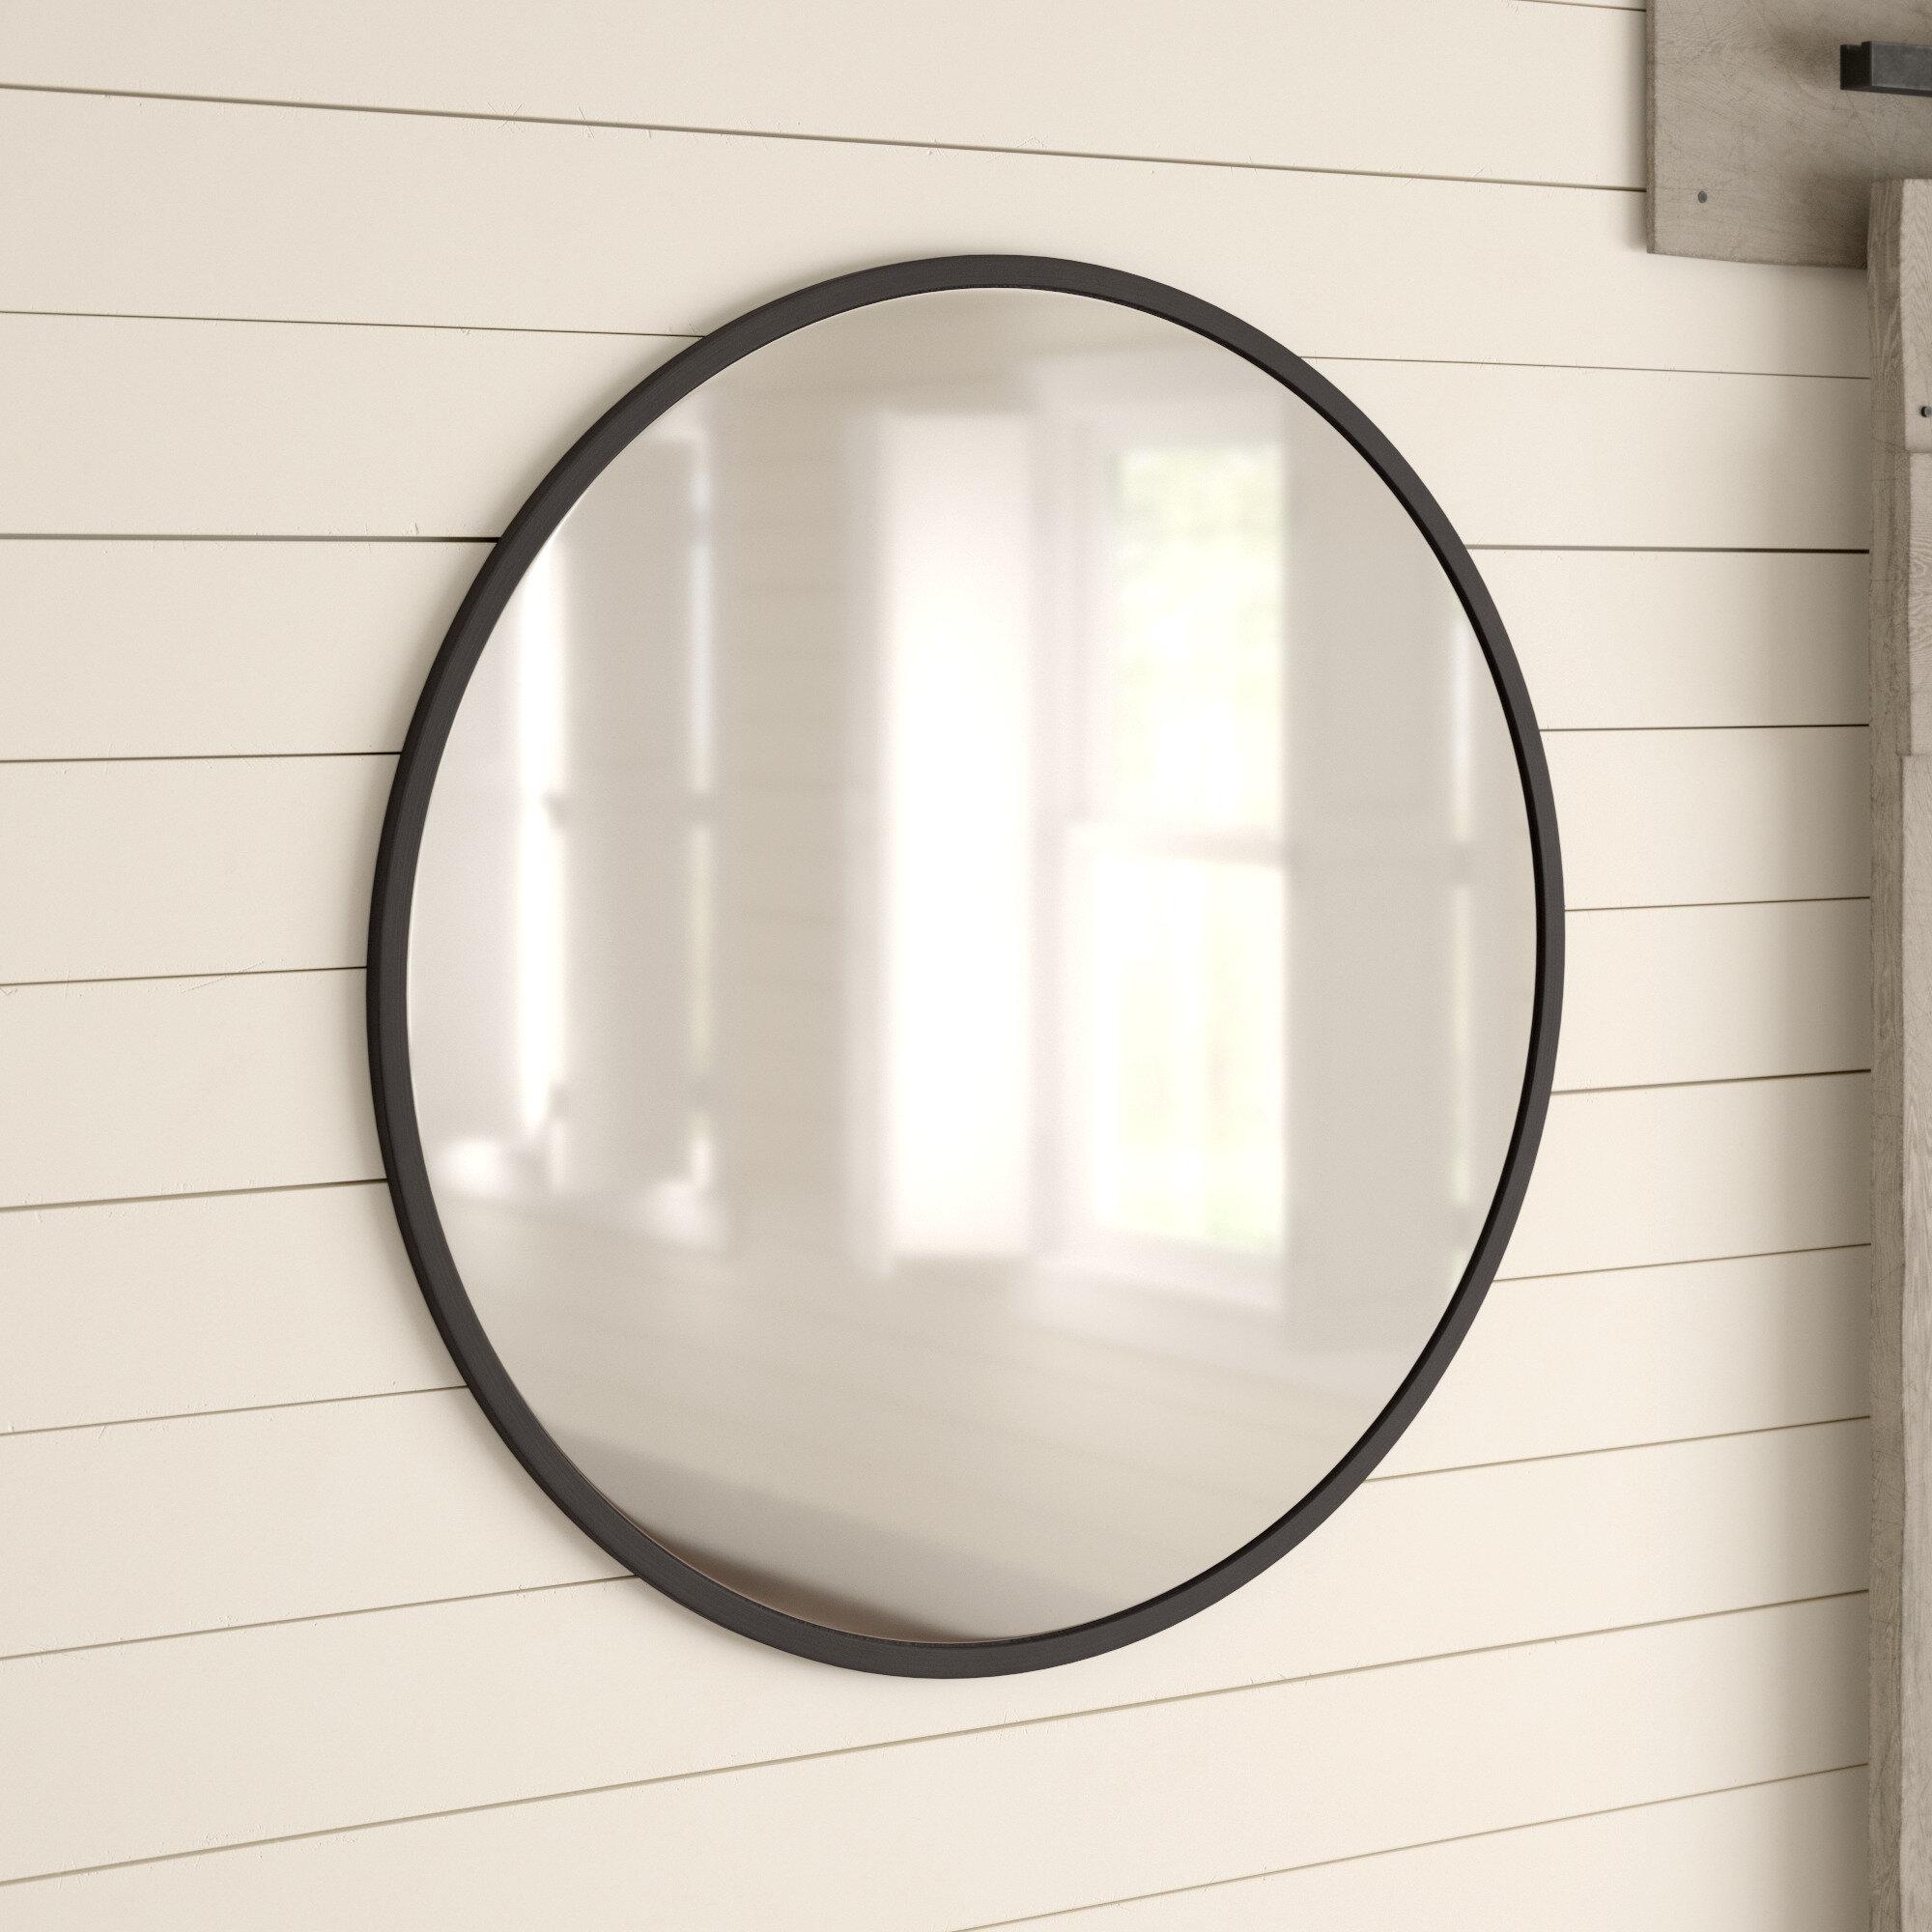 Farmhouse & Rustic Gray Bathroom Mirrors | Birch Lane regarding Koeller Industrial Metal Wall Mirrors (Image 6 of 30)